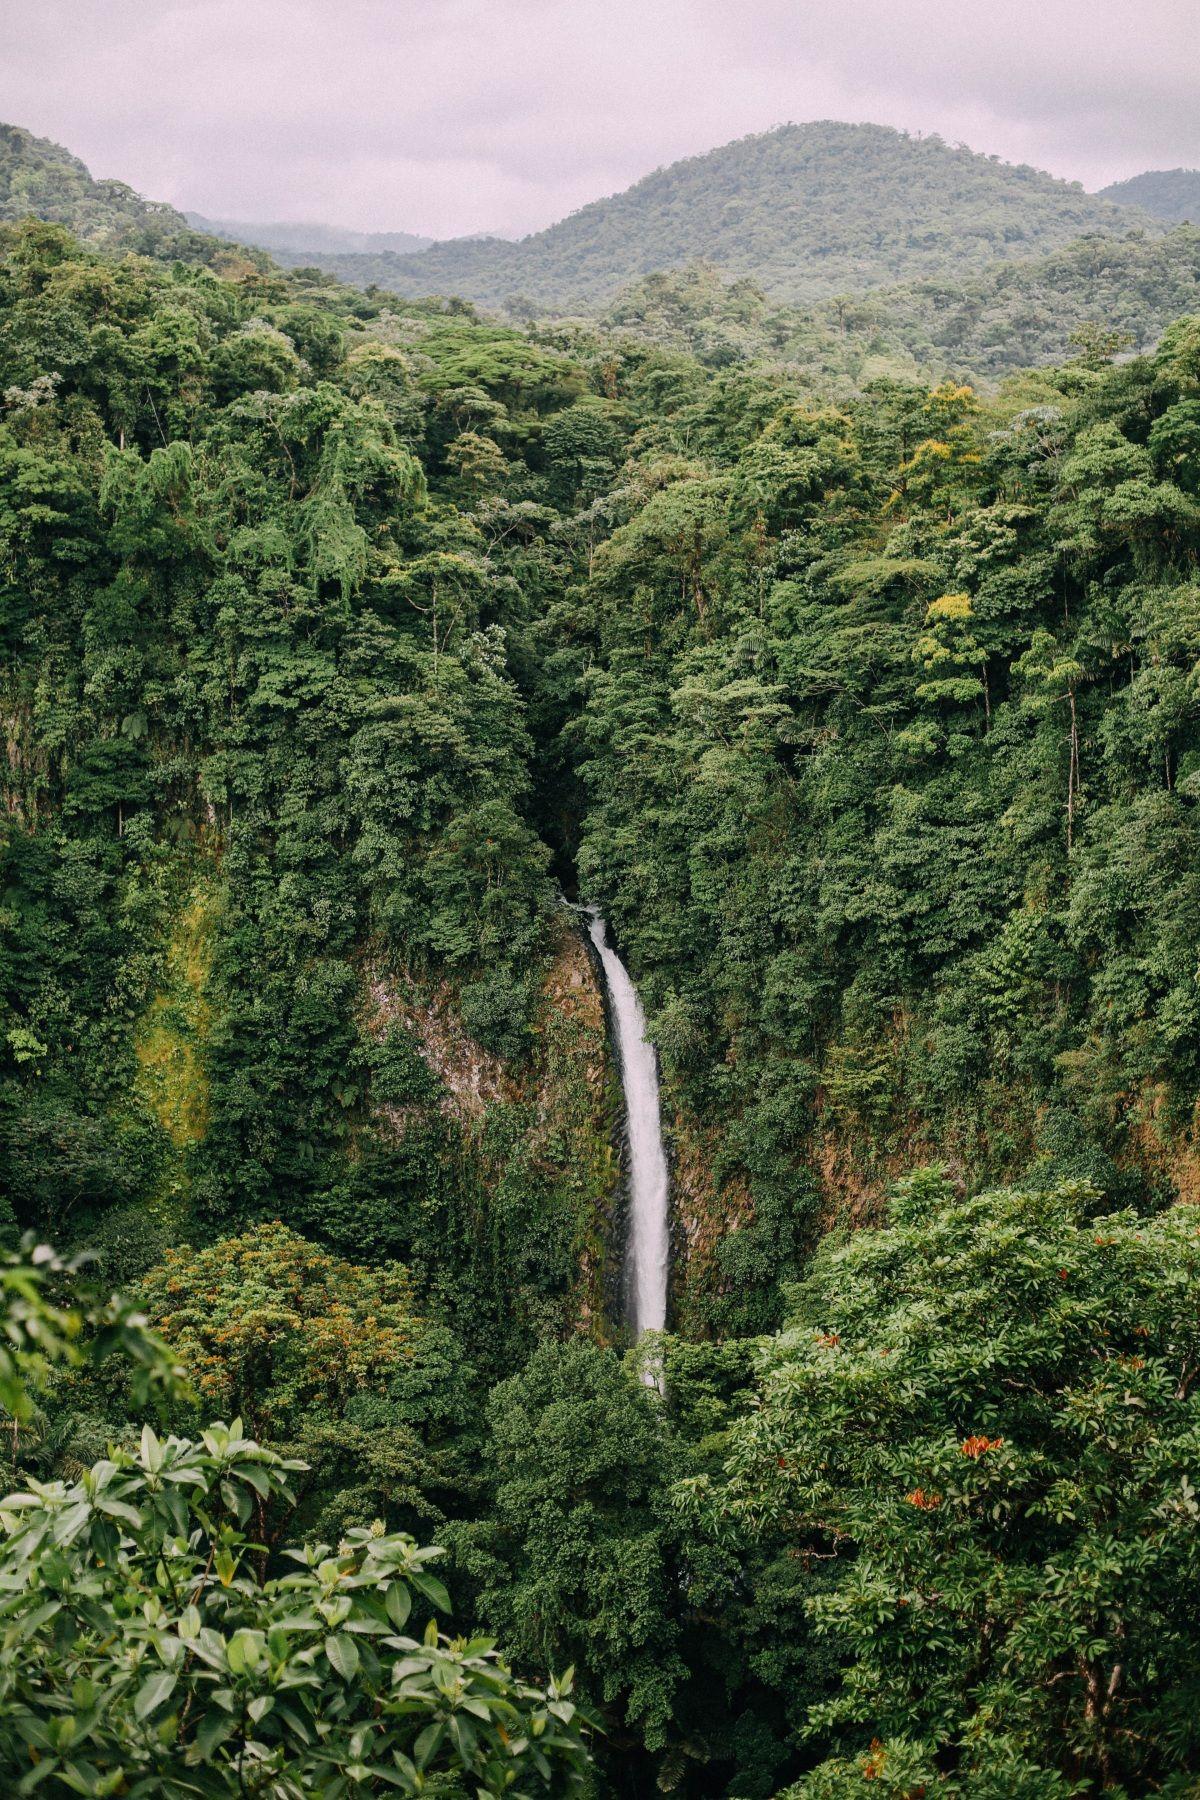 costa-rica-natalie-off-duty-travel-14-4003